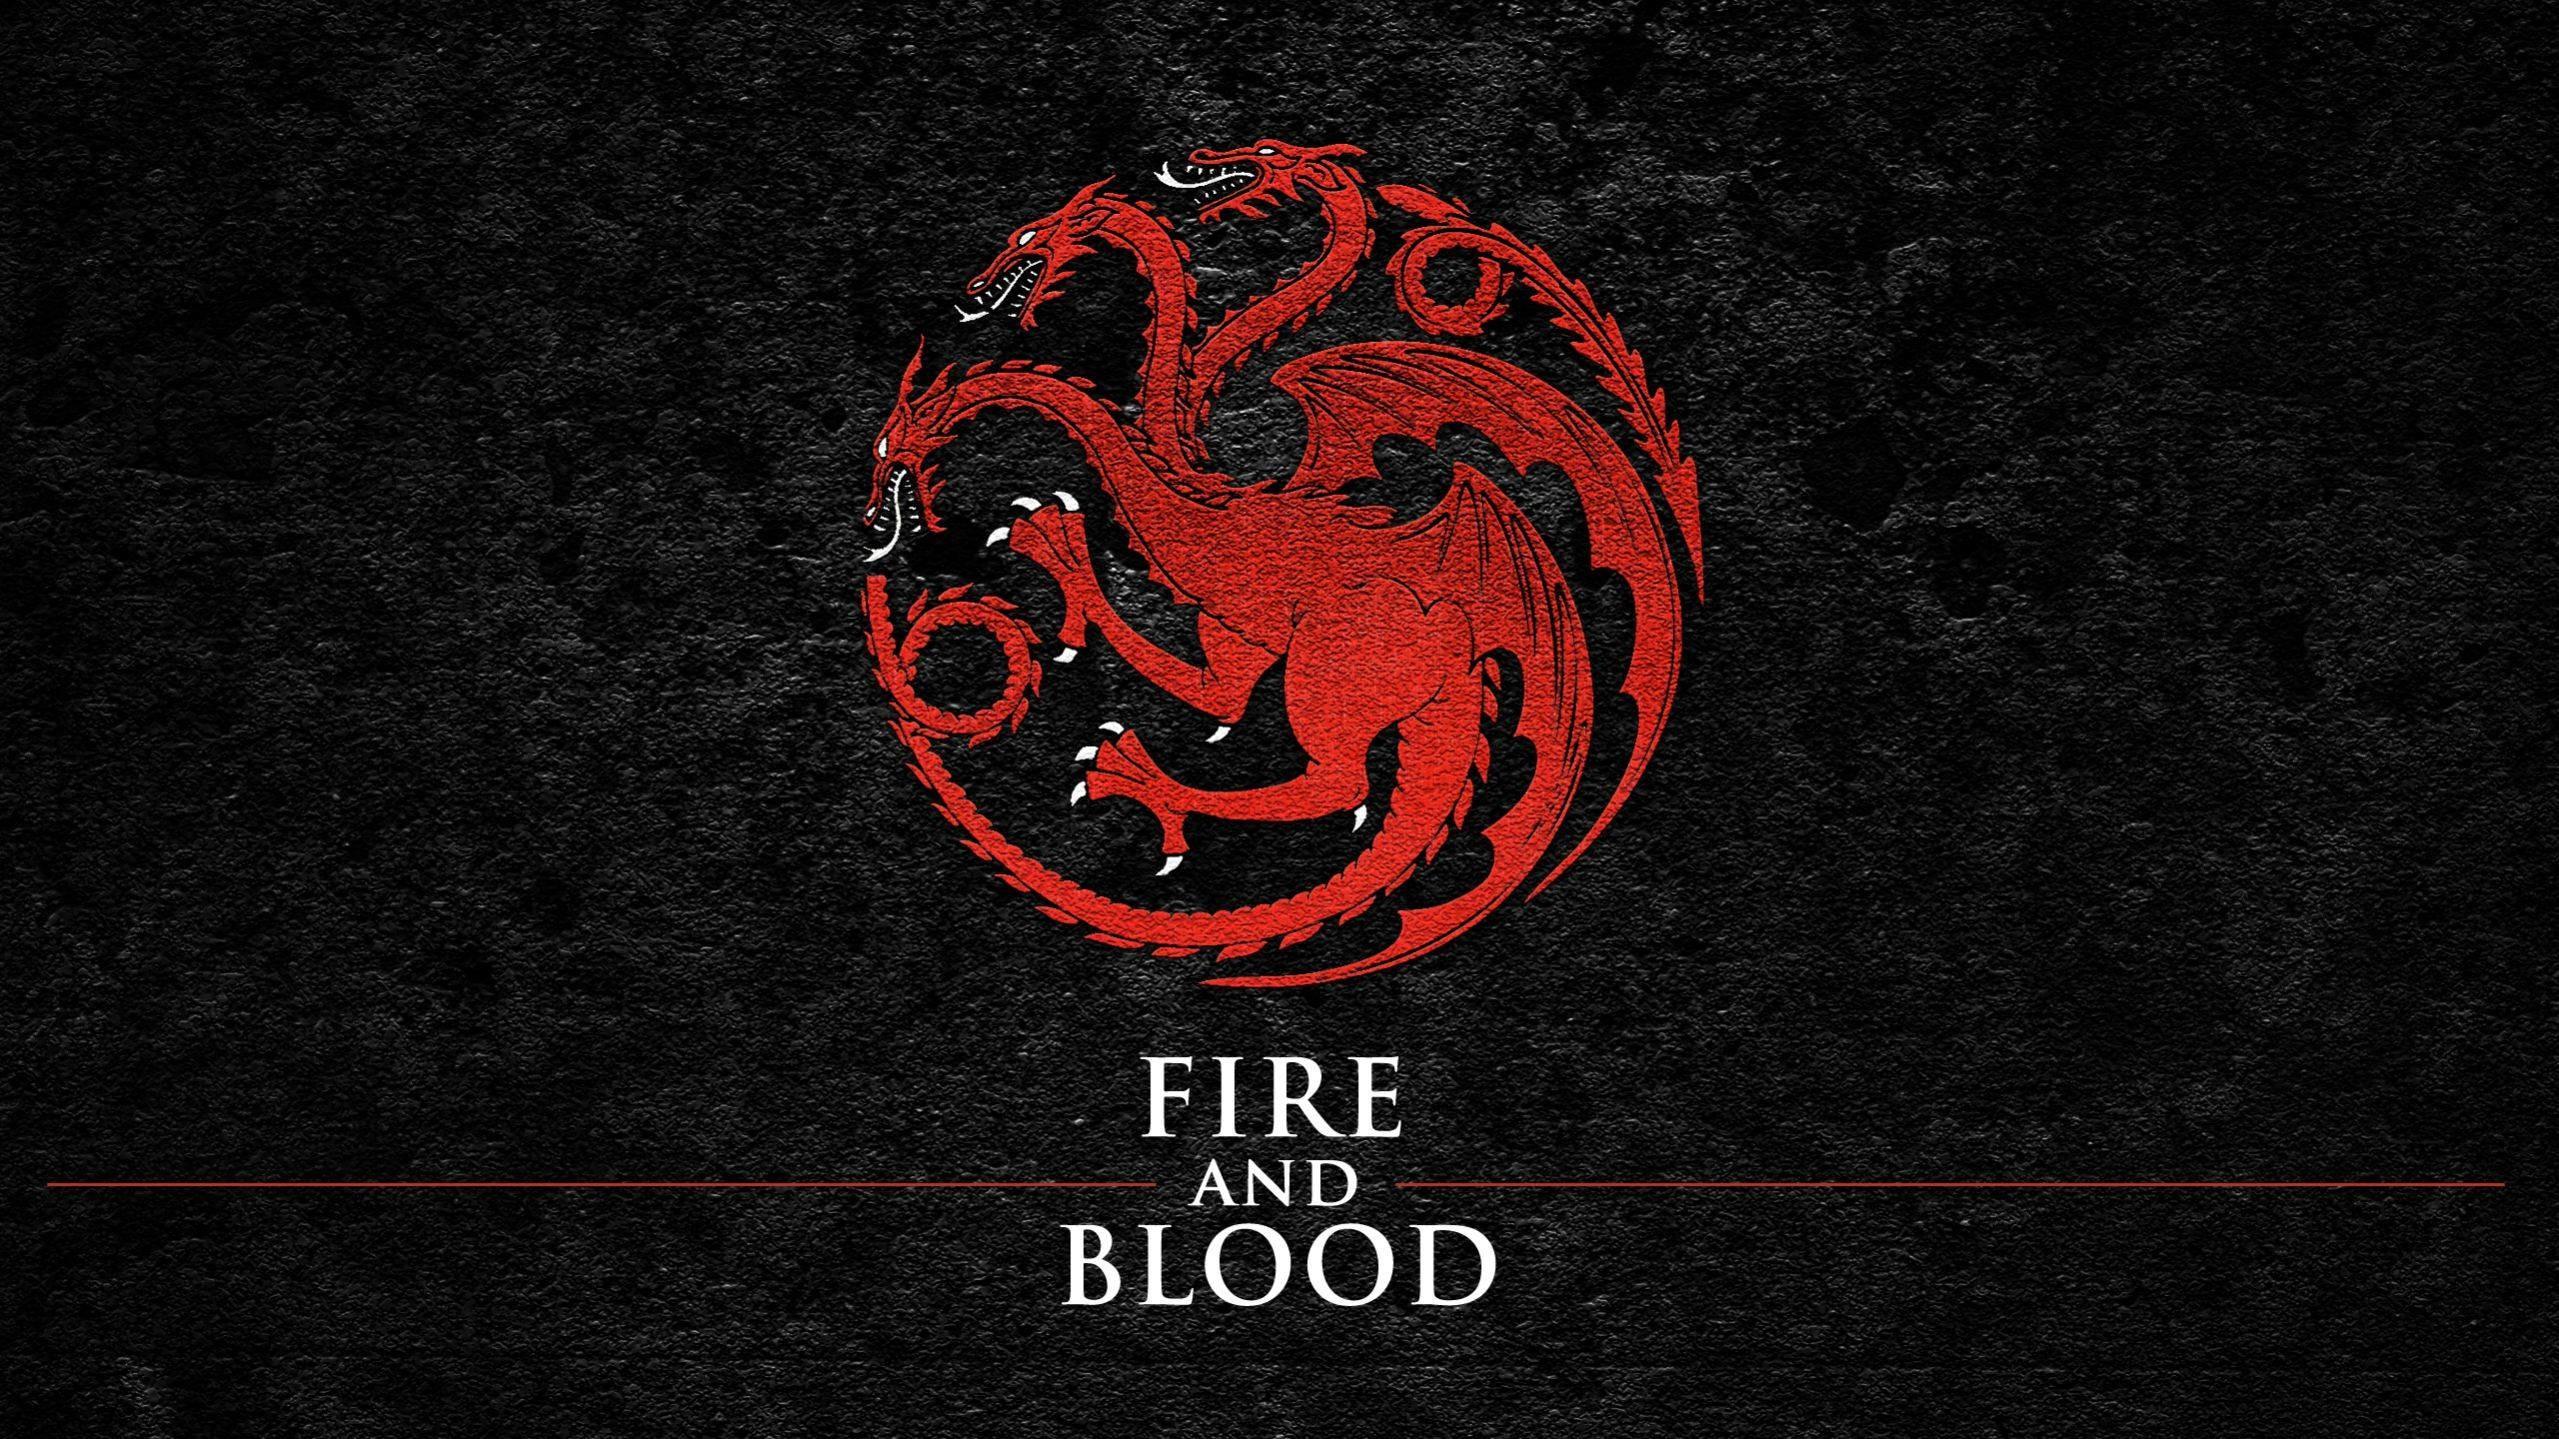 FunMozar – House Targaryen Sigil